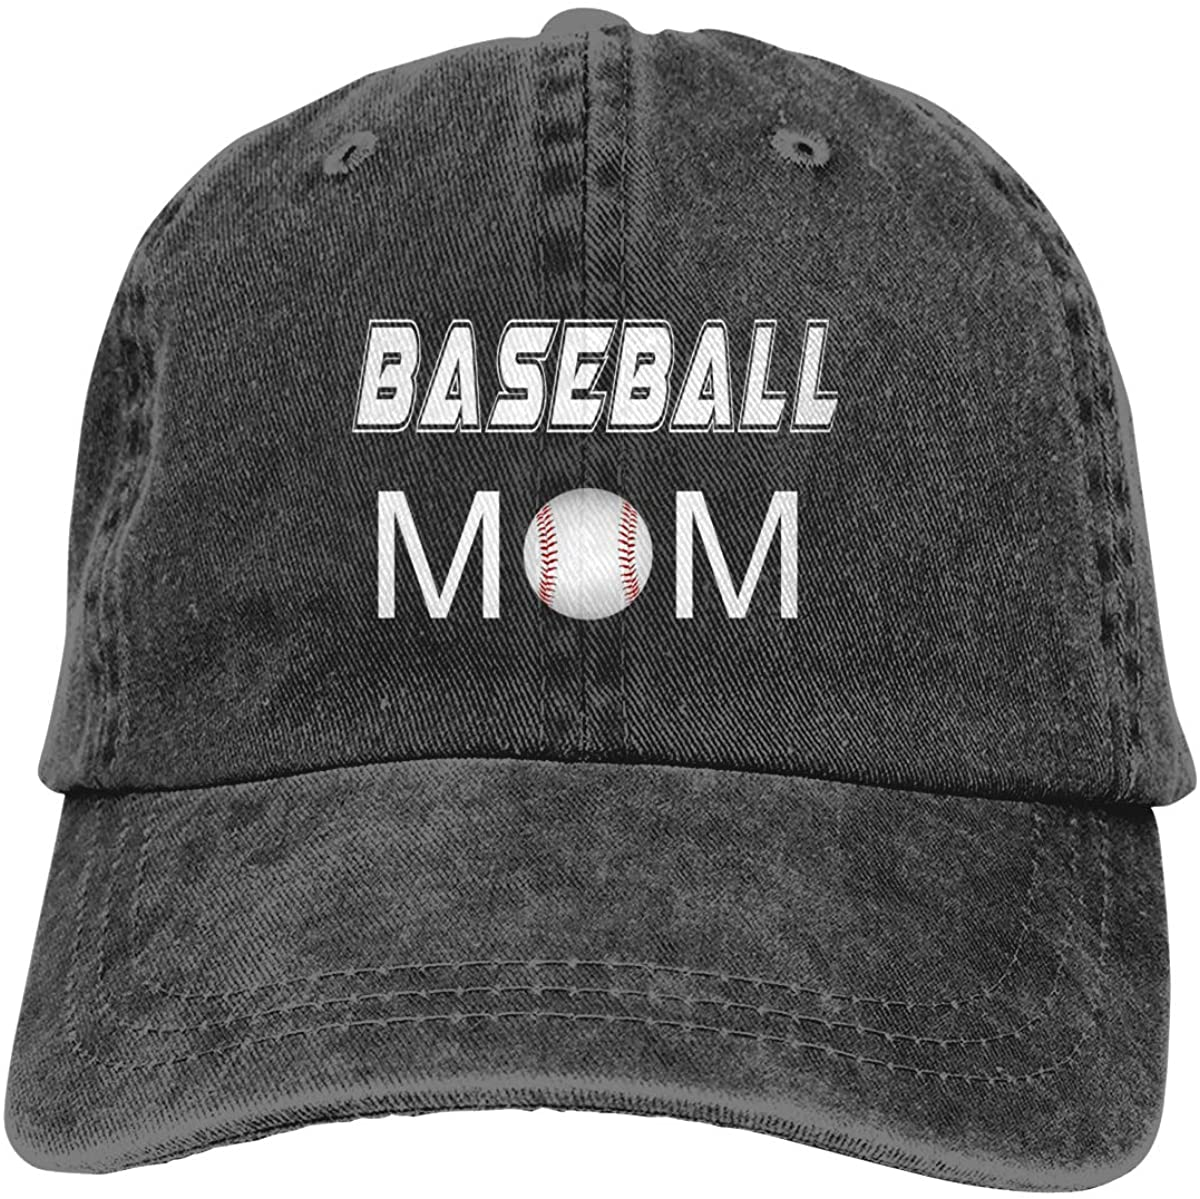 Baseball Mom Black Vintage Adjustable Baseball Cap for Mom Great Idea